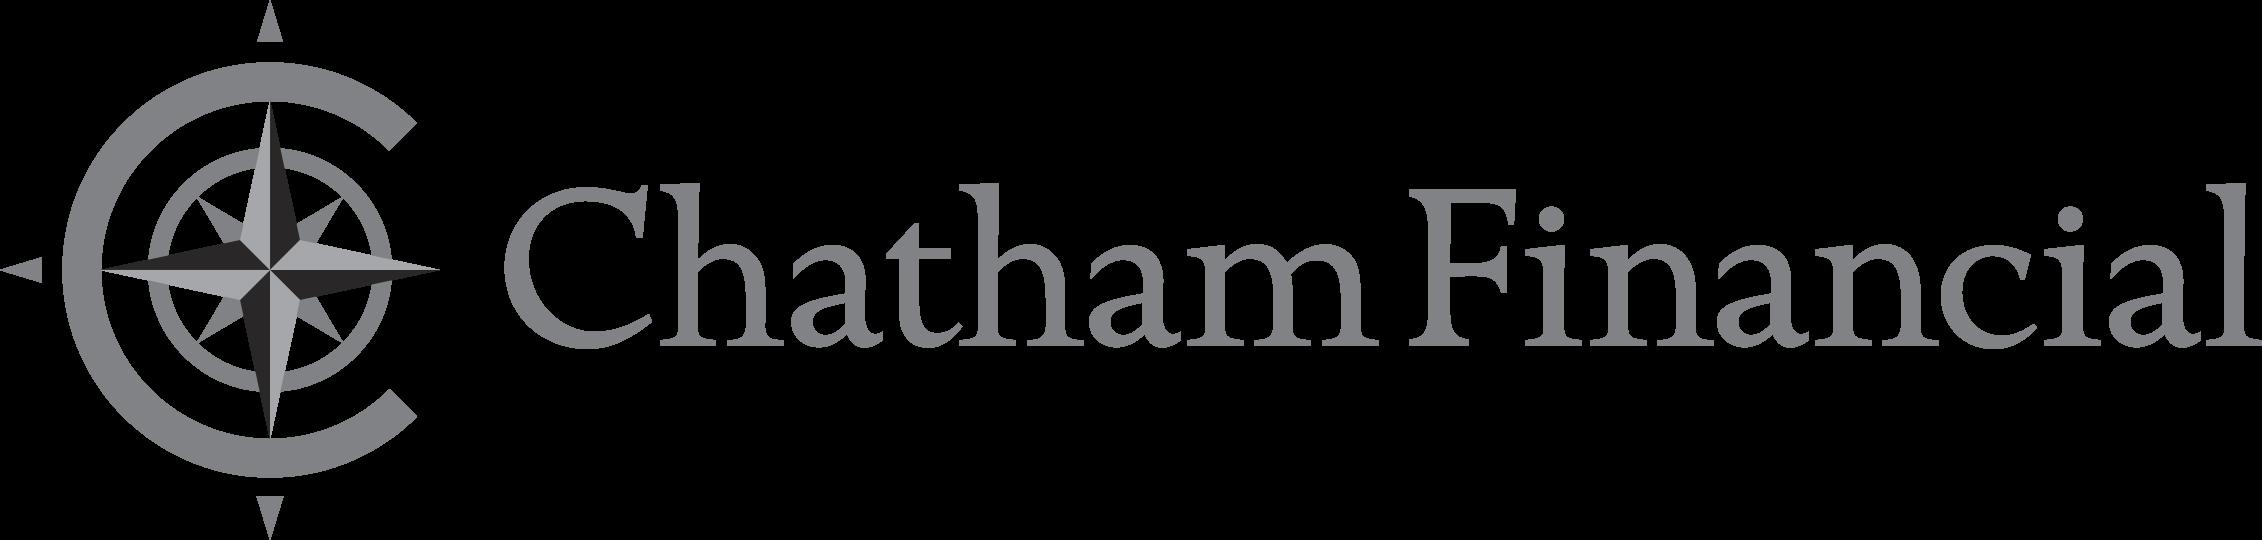 chatham-financial-logo